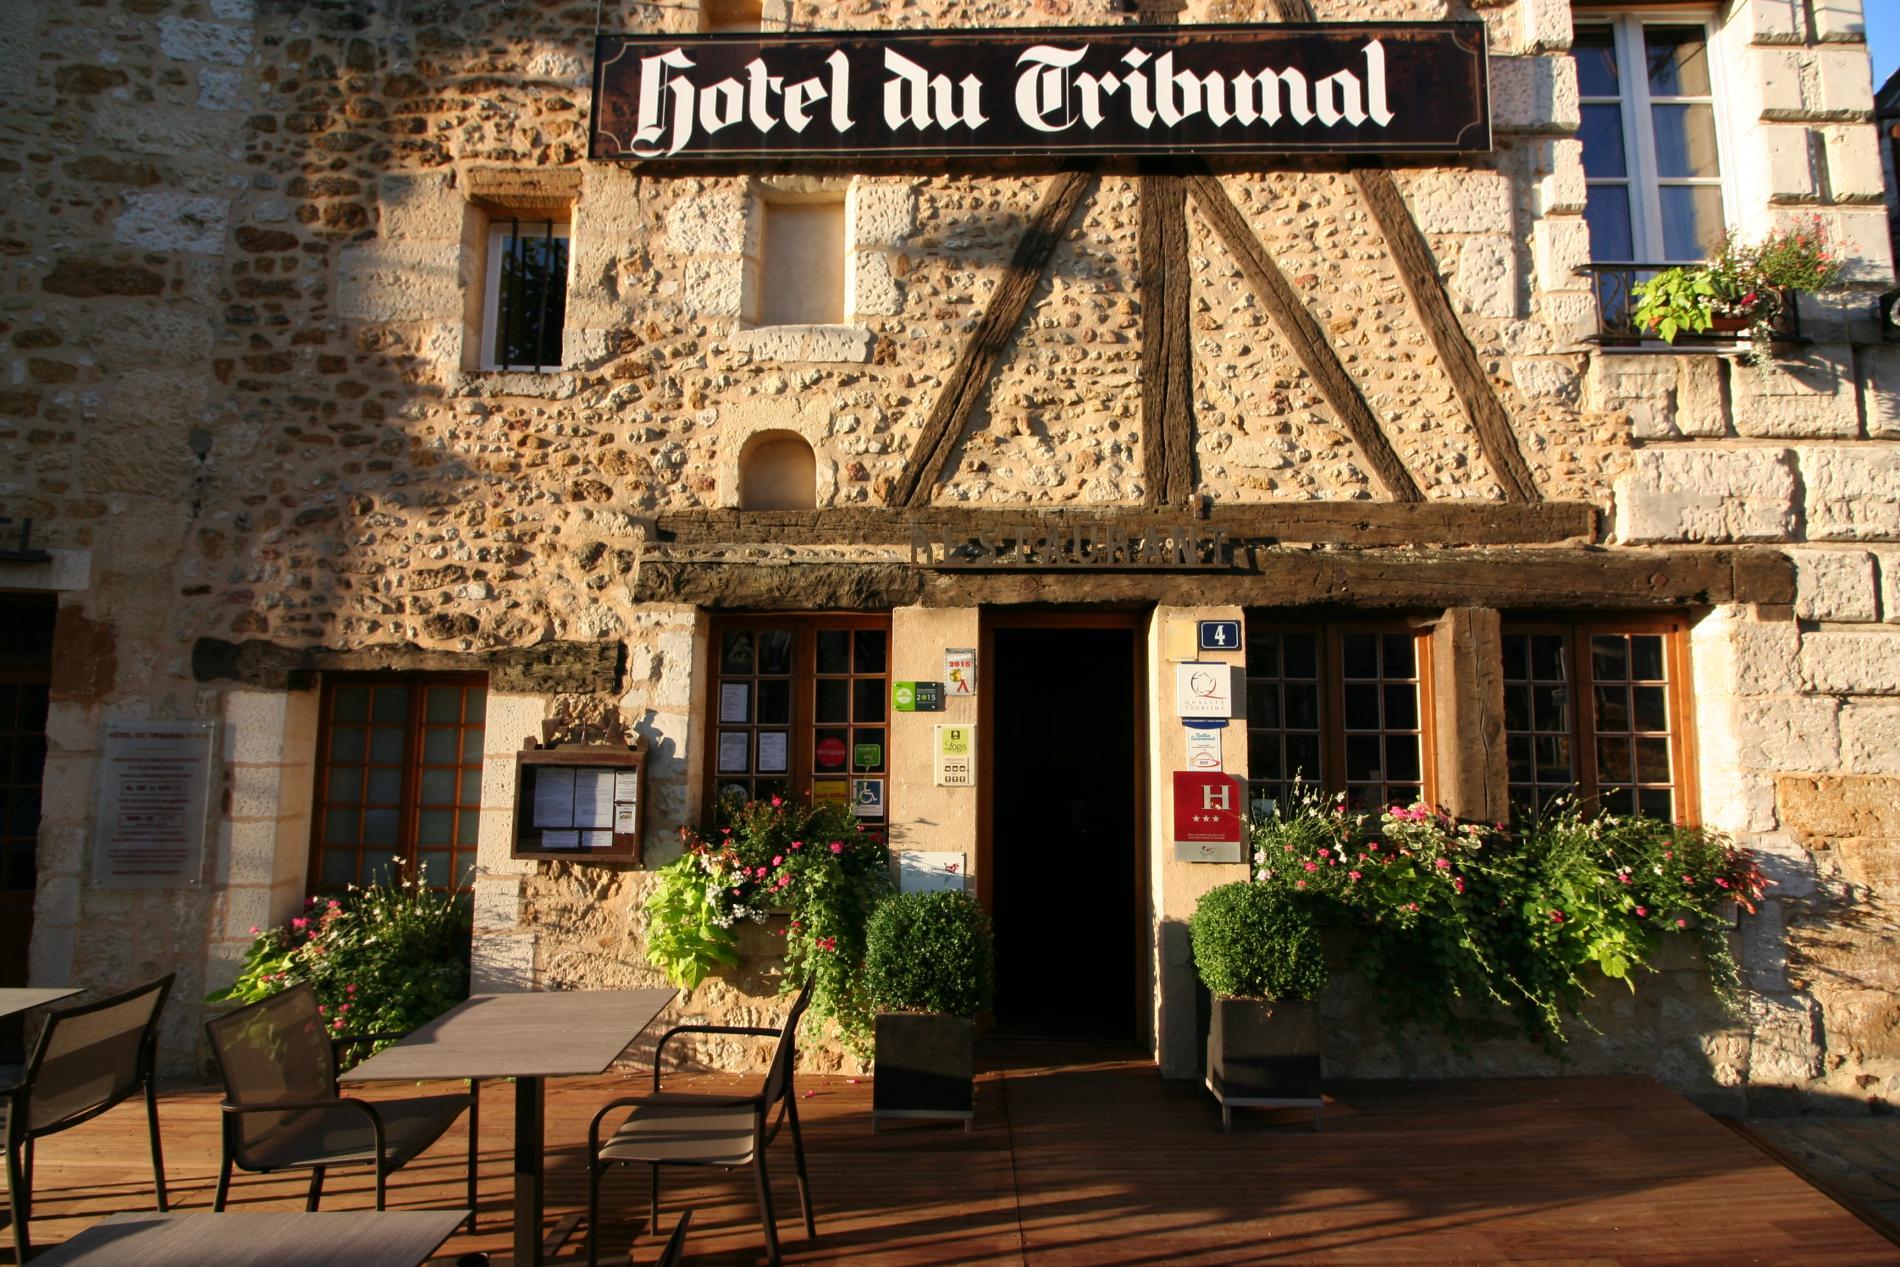 Hotel du Tribunal - Hotel de charme en Normandie